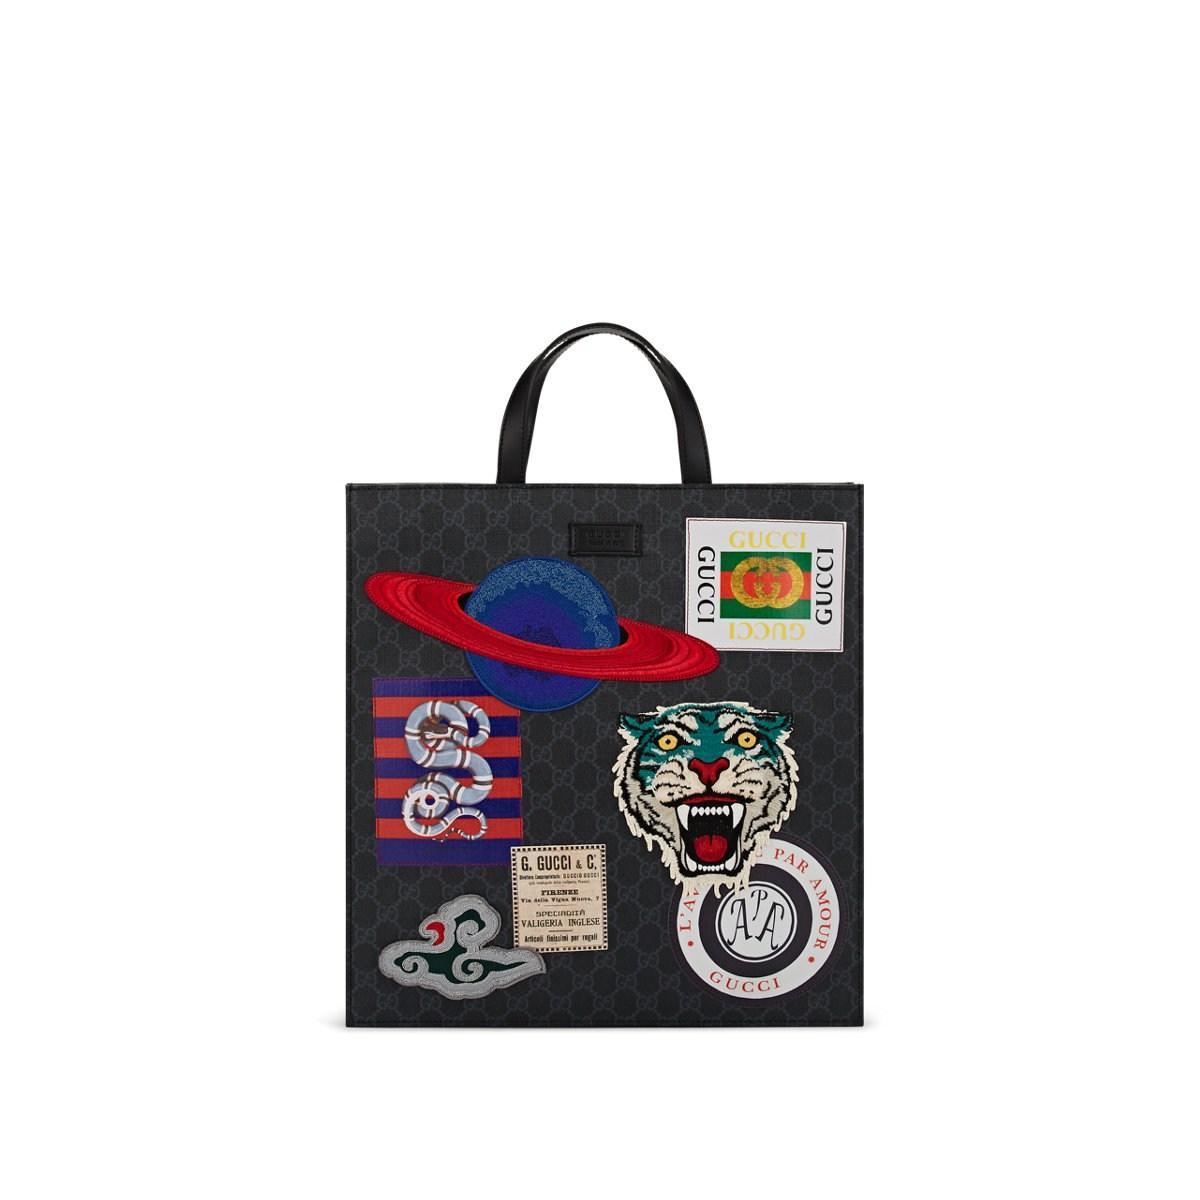 fd73a6f756f Gucci - Black Appliquéd GG Supreme Canvas Shopper Tote Bag for Men - Lyst.  View fullscreen